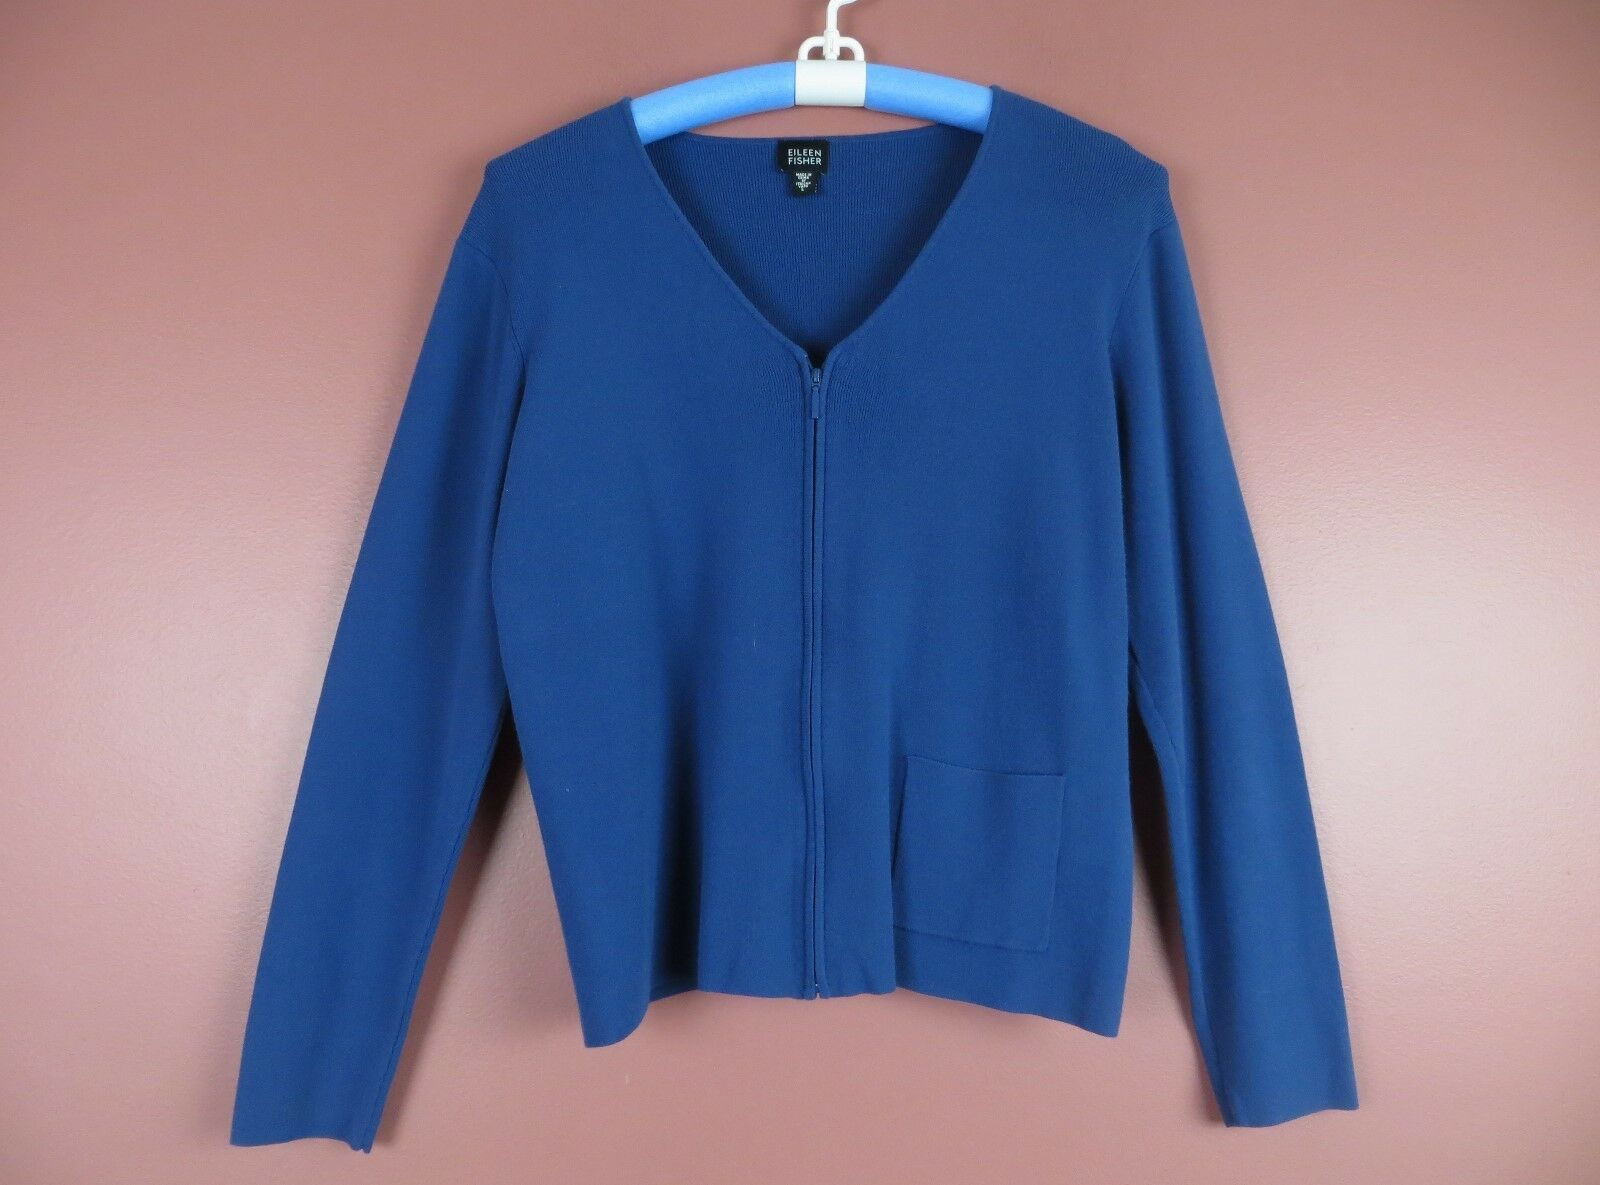 SC000365-EILEEN FISHER Womens Viscose Nylon Zip Front Cardigan Deep Slate bluee L